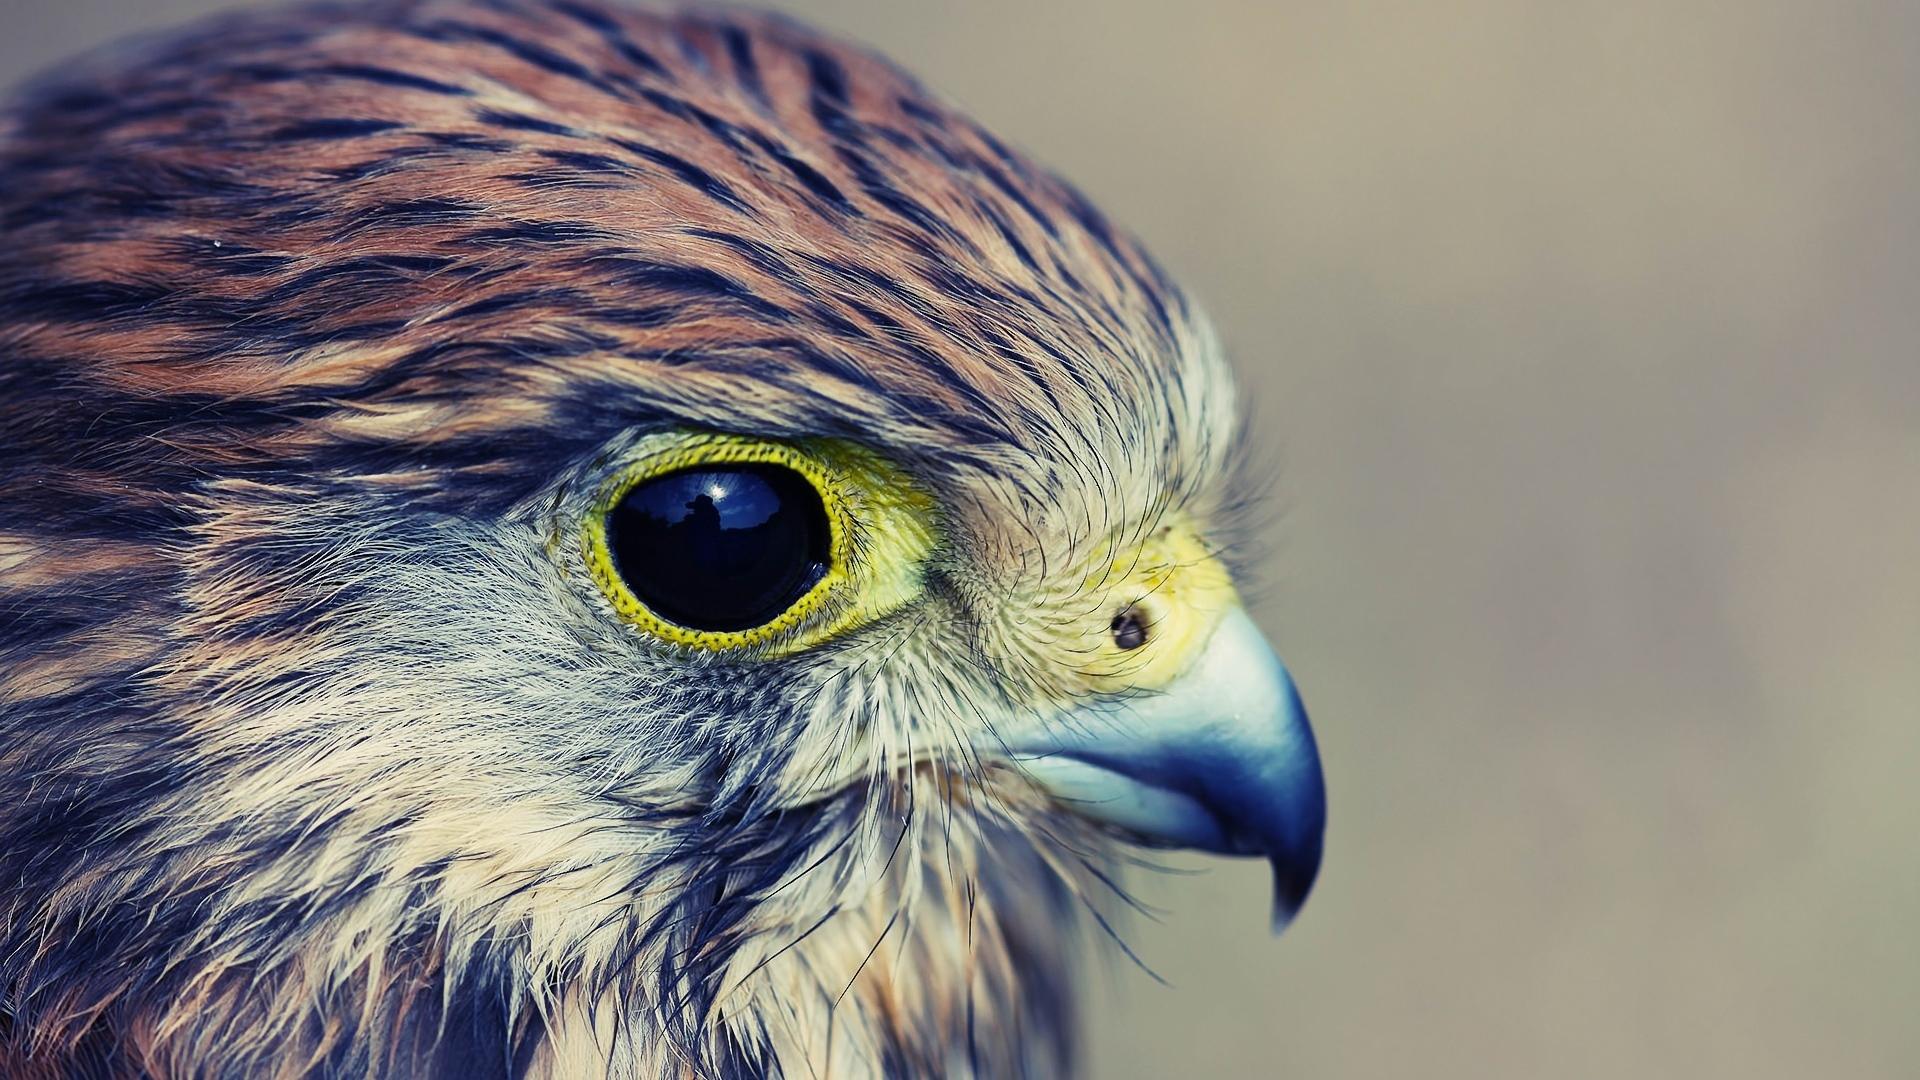 Ice Cream Wallpaper Hd 1080p Download Wallpaper 1920x1080 Eagle Baby Hawk Head Beak